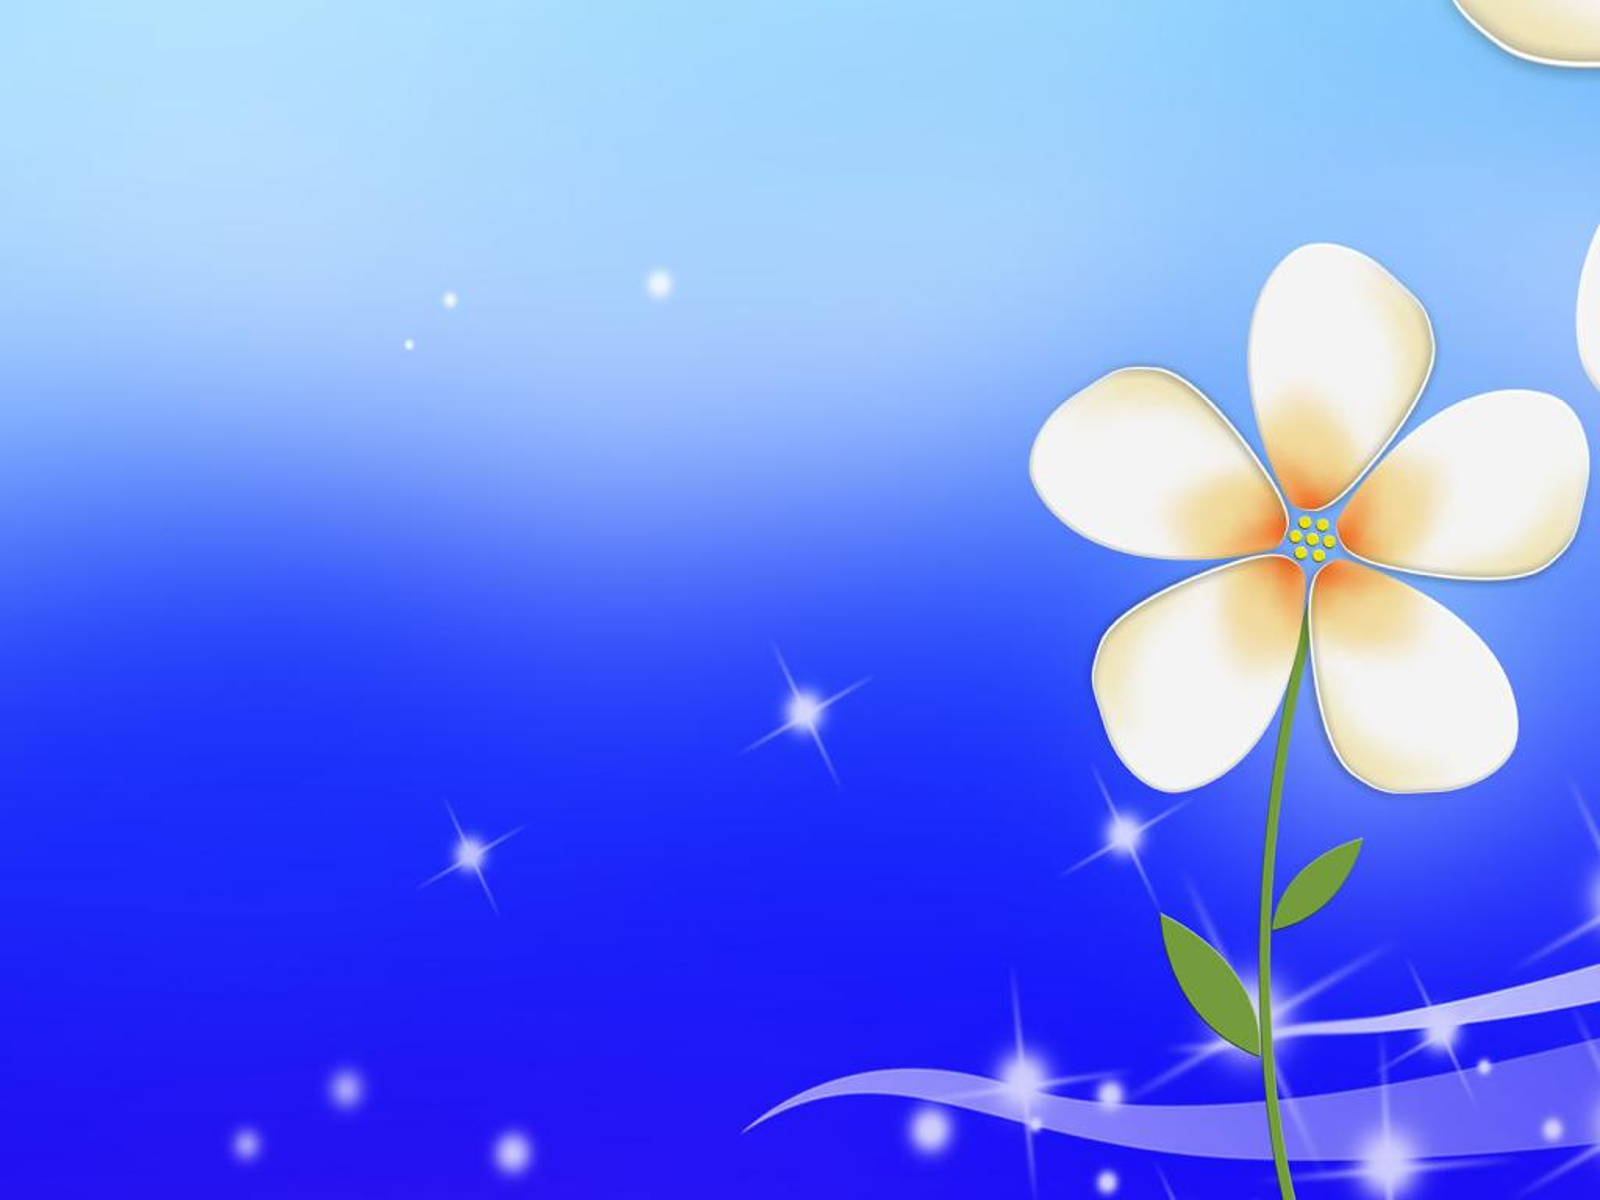 Little Flower PPT Backgrounds